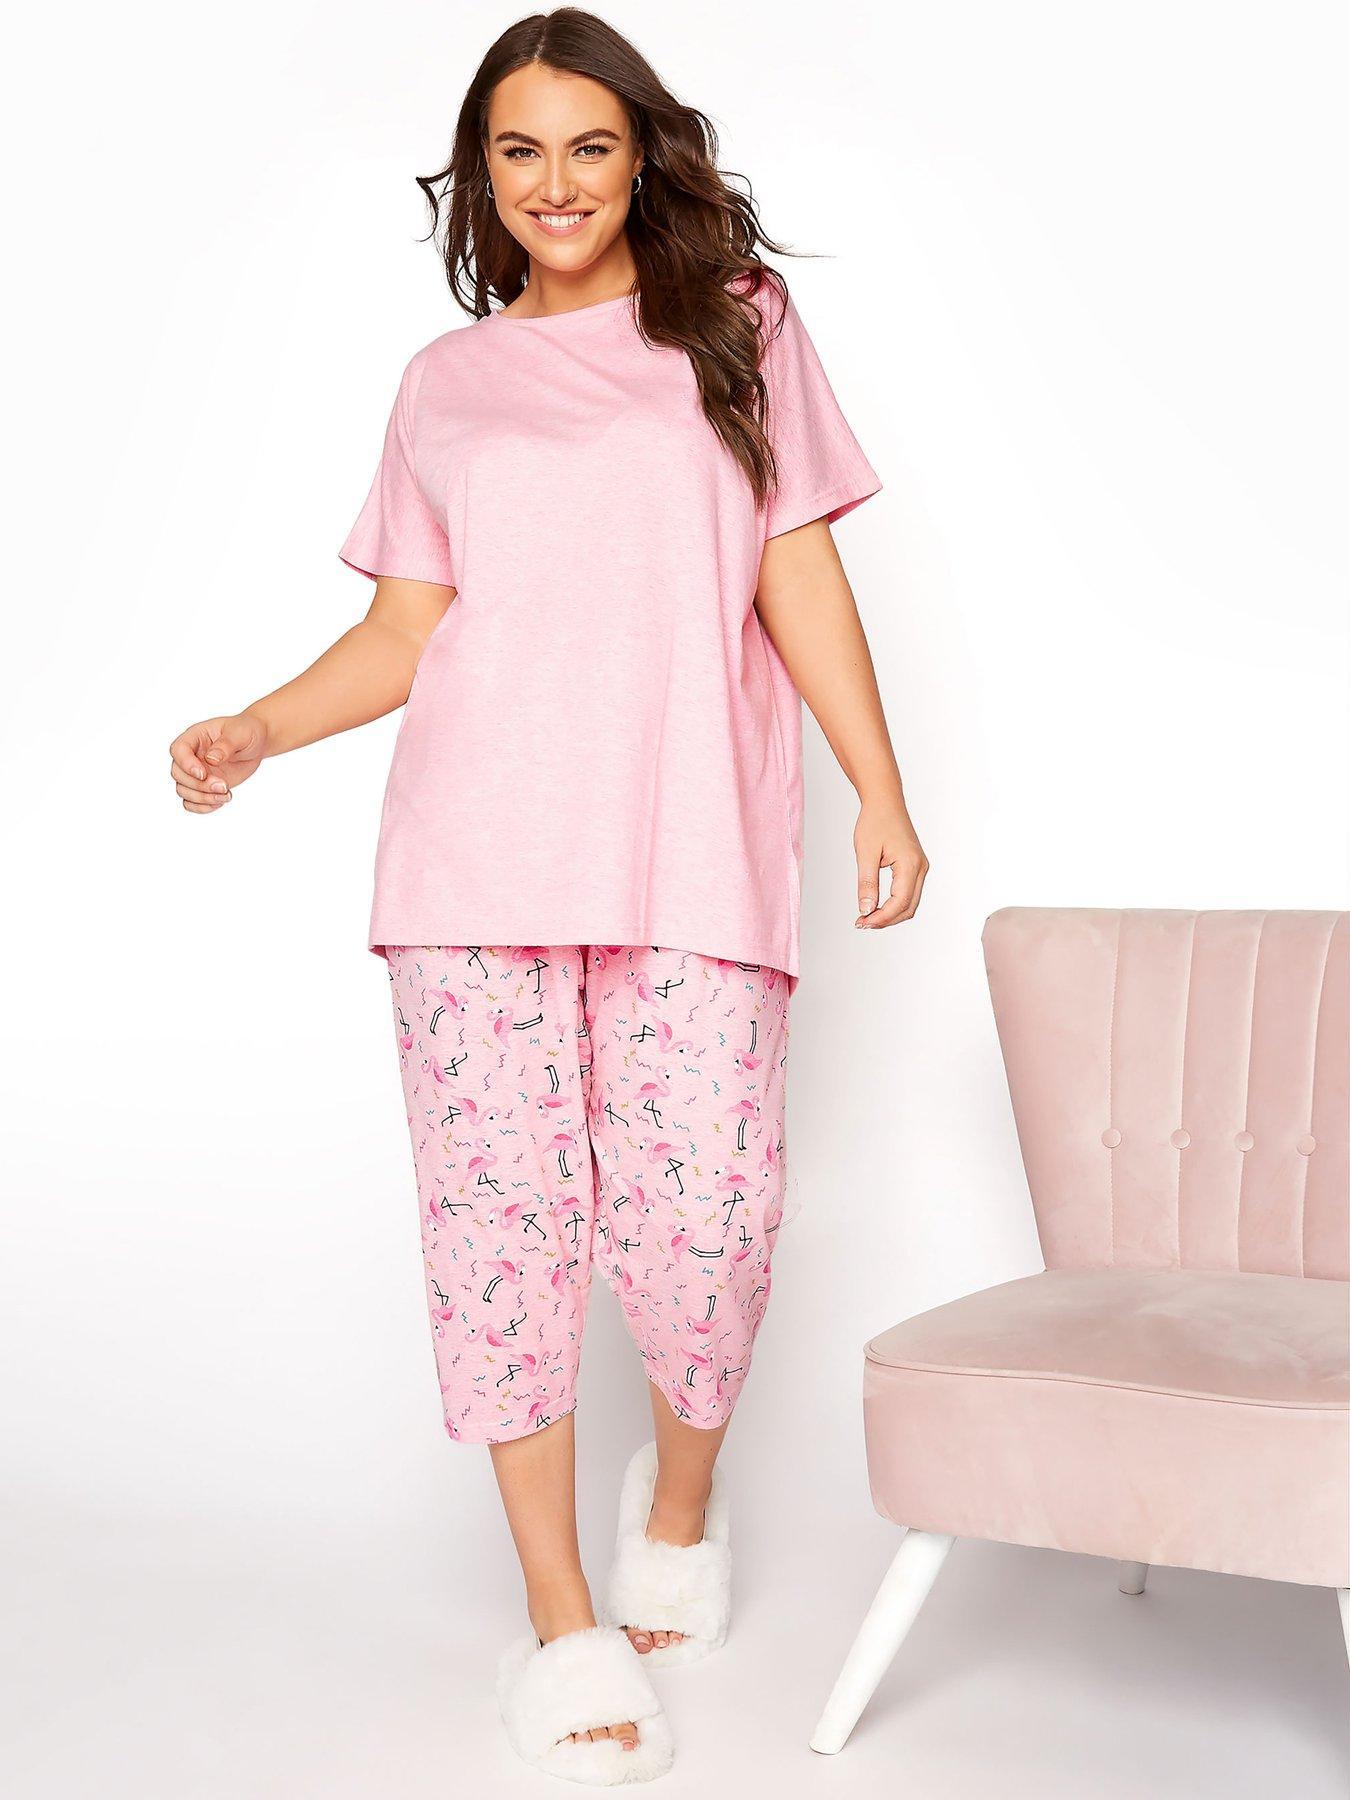 Details about  /Ladies Short Sleeve Pyjama Set 100/% Cotton Womens Cosy Teddy Nightwear PJ Set